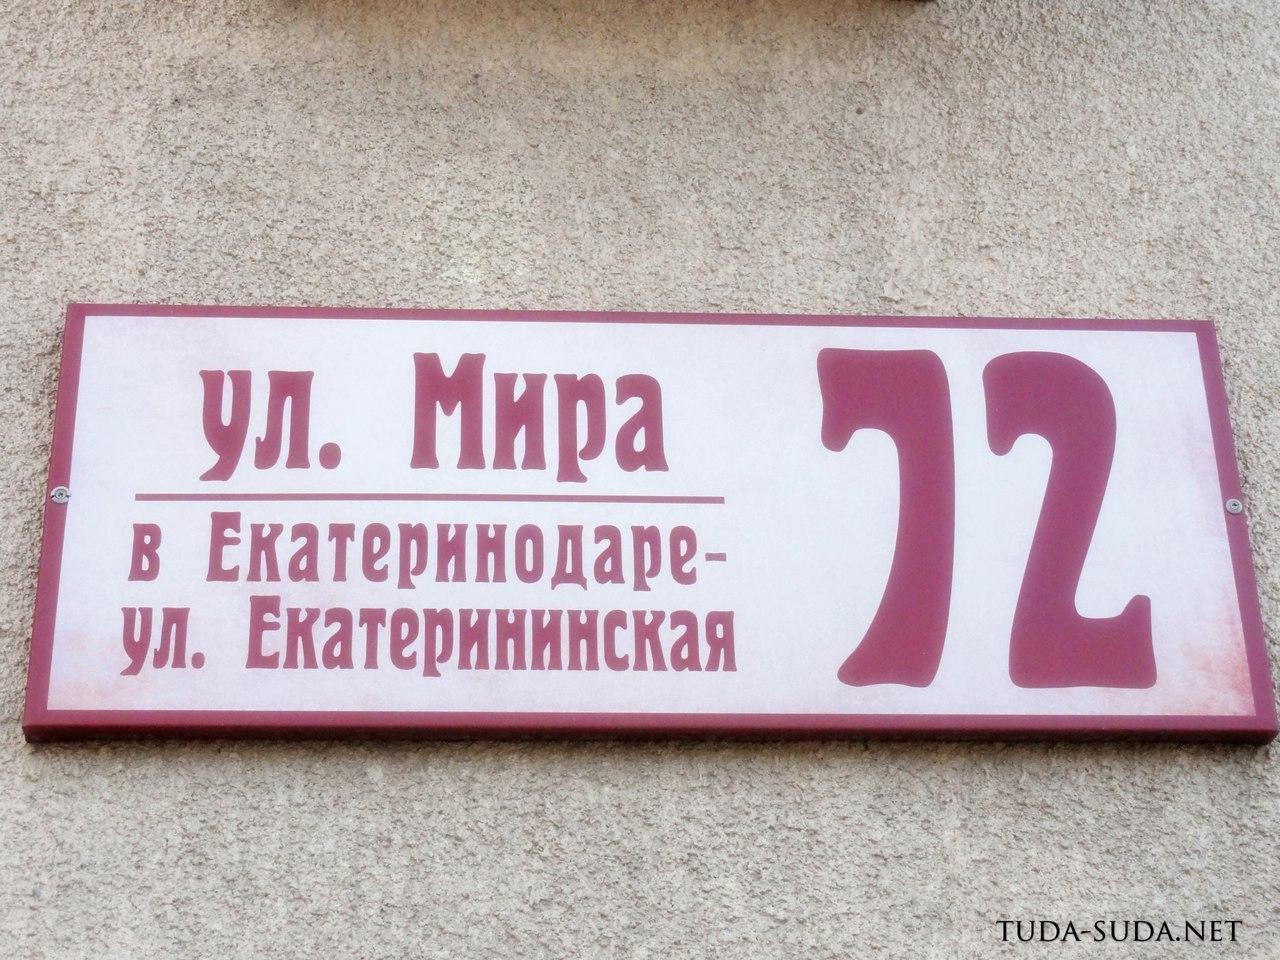 Краснодар, улица Мира